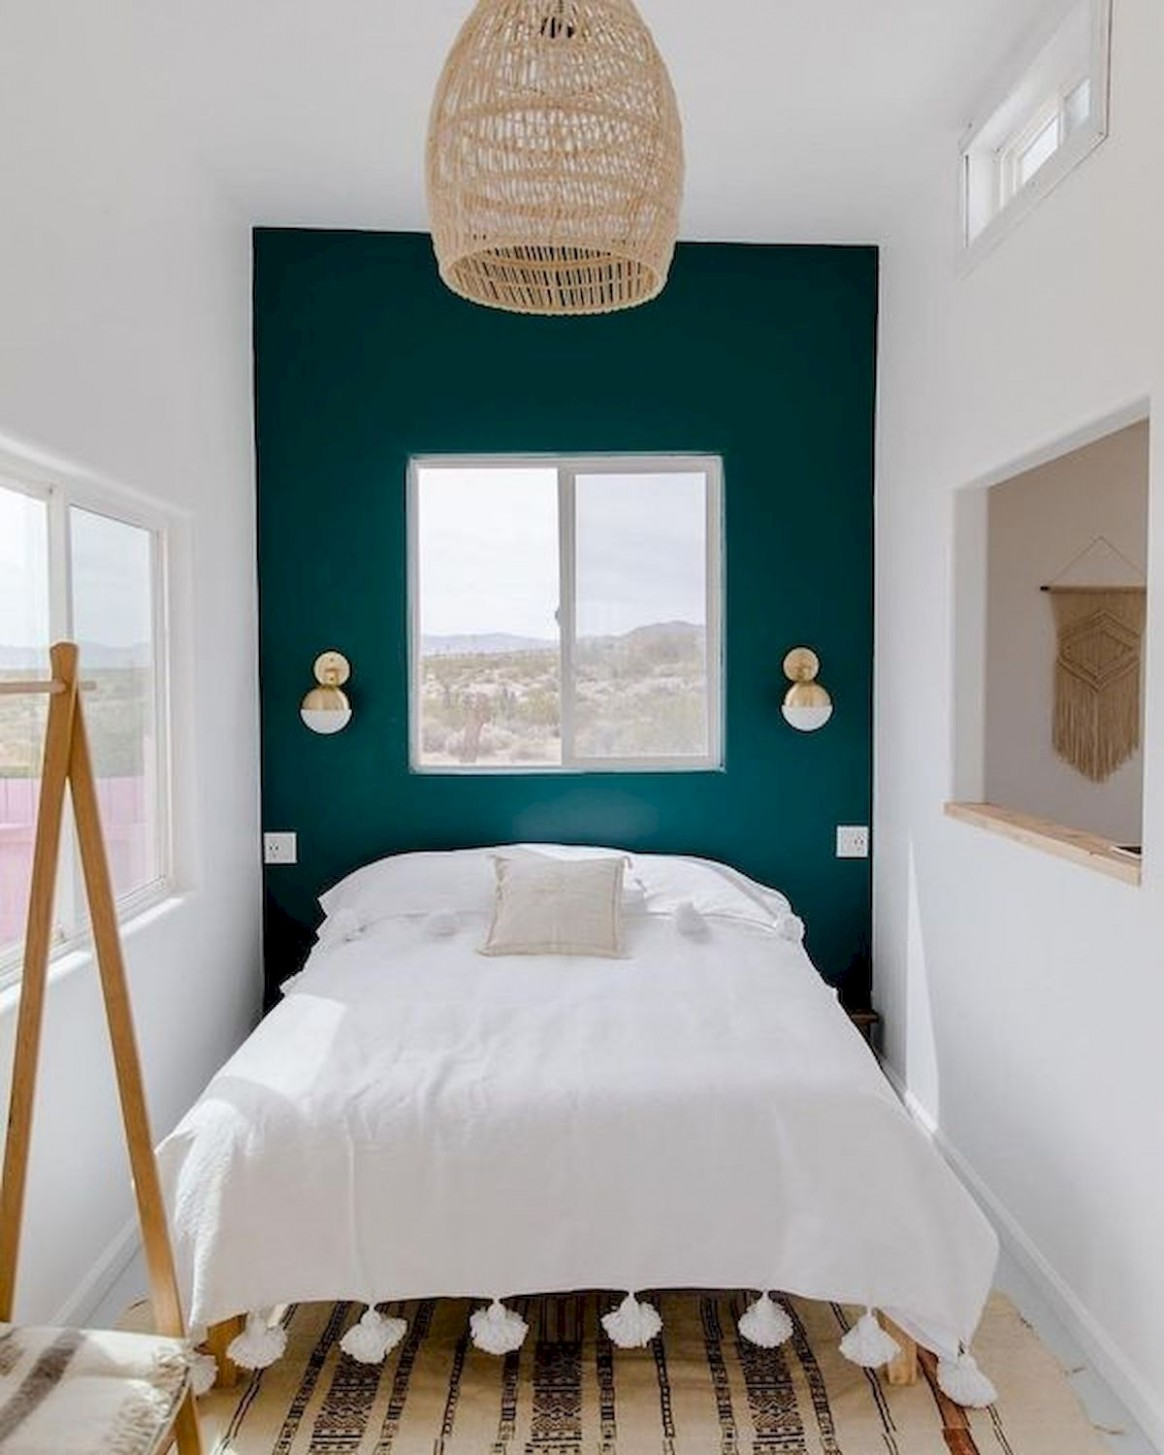 12 Wonderful Small Apartment Bedroom Design Ideas and Decor  - Bedroom Ideas Apartment